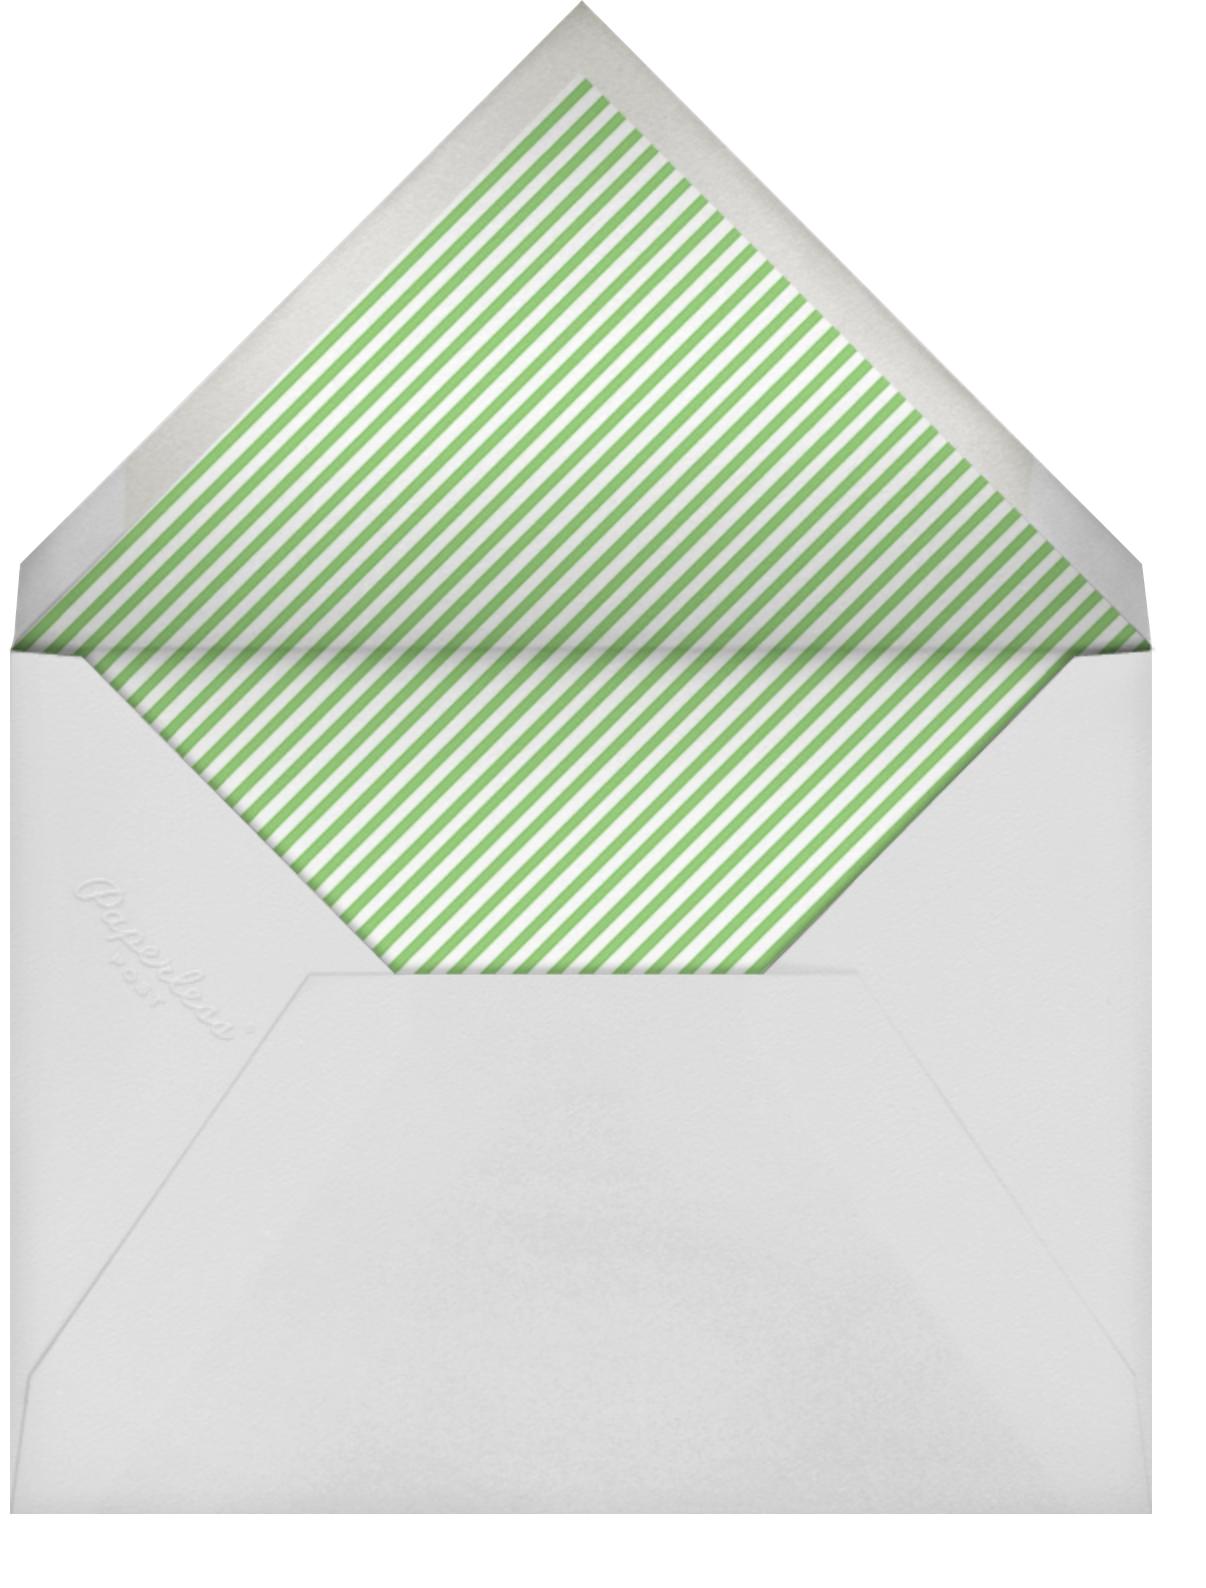 Baby Onesie - Green - Paper Source - Baby shower - envelope back